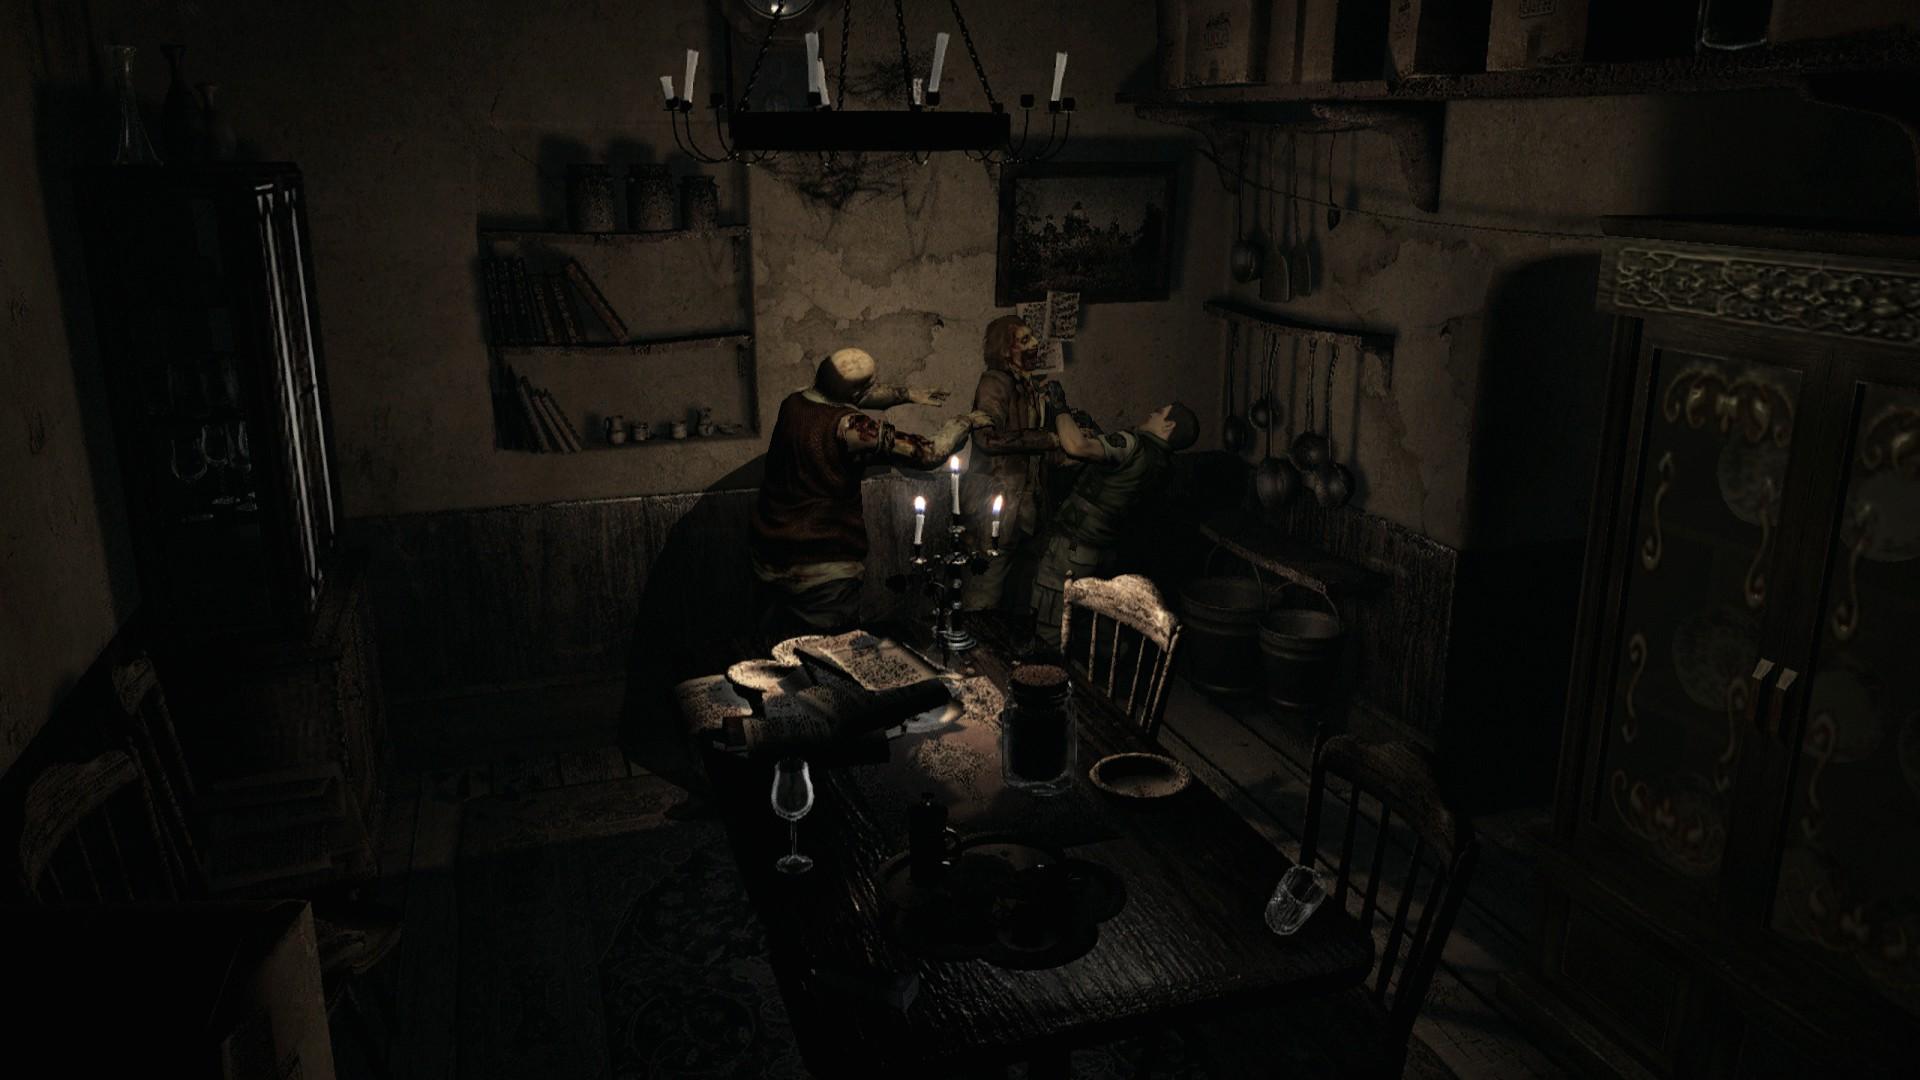 Resident Evil HD REMASTER - corepacks - 4.26 GB